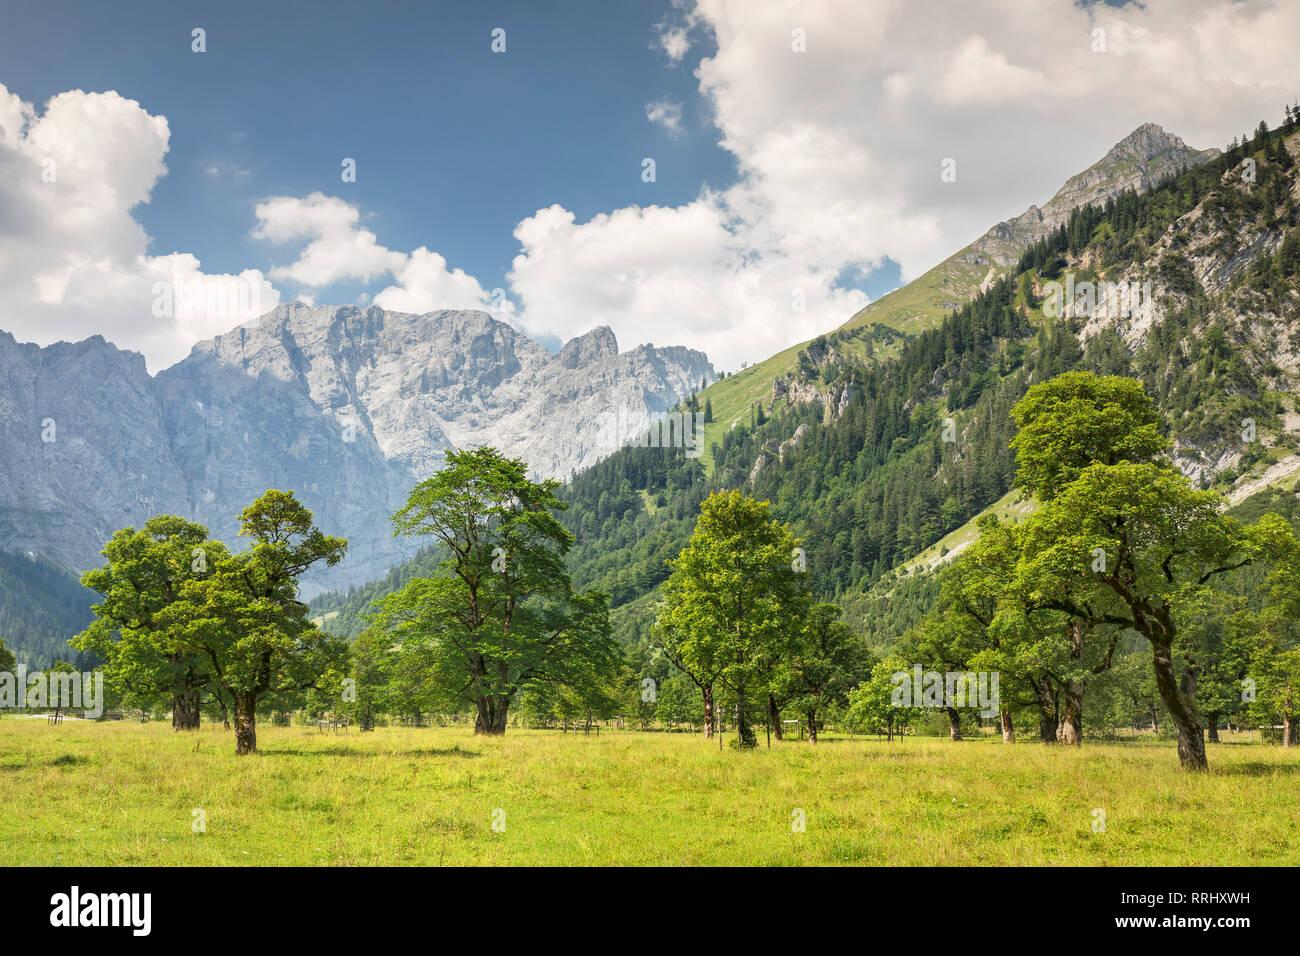 Grosser Ahornboden, maple trees, Karwendel mountains, nature reserve, Eng, Hinterriss, Tyrol, Austria, Europe - Stock Image